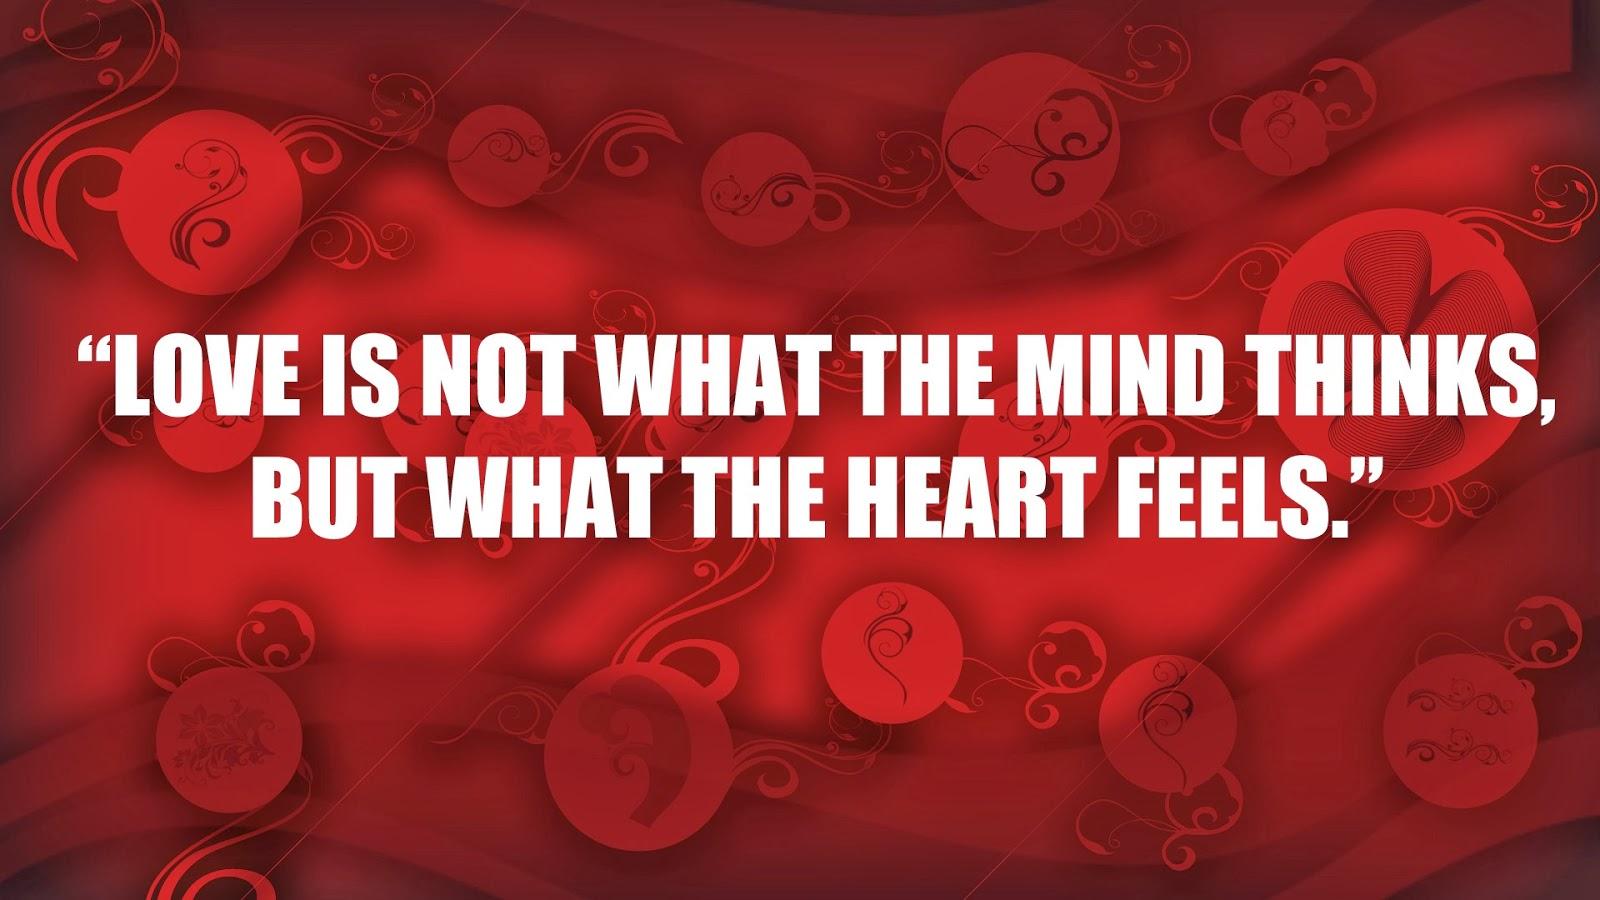 Heart Touching Love Quotes Hd Wallpapers - Pilatus - HD Wallpaper